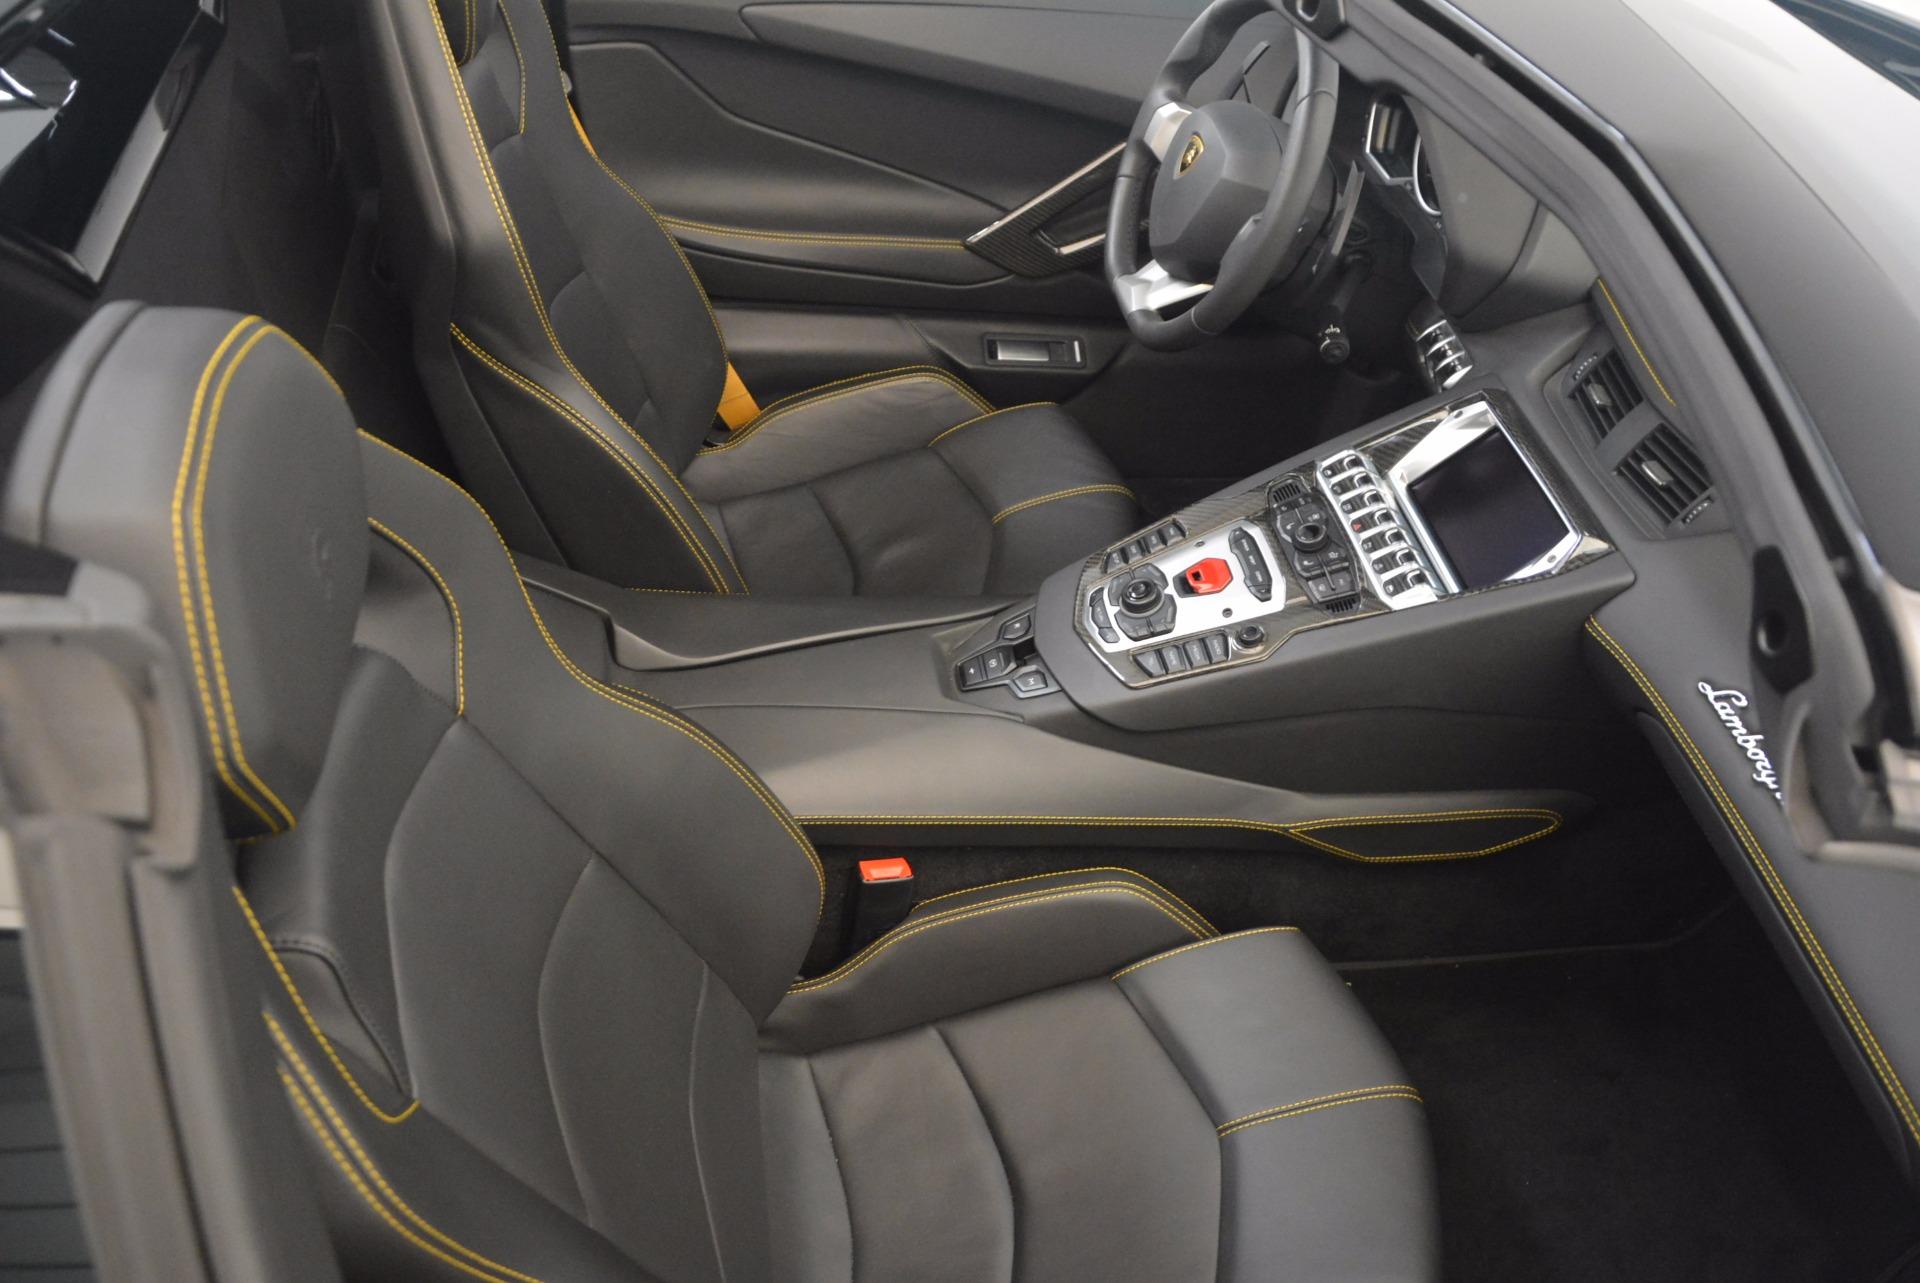 Used 2015 Lamborghini Aventador LP 700-4 For Sale In Westport, CT 1217_p28